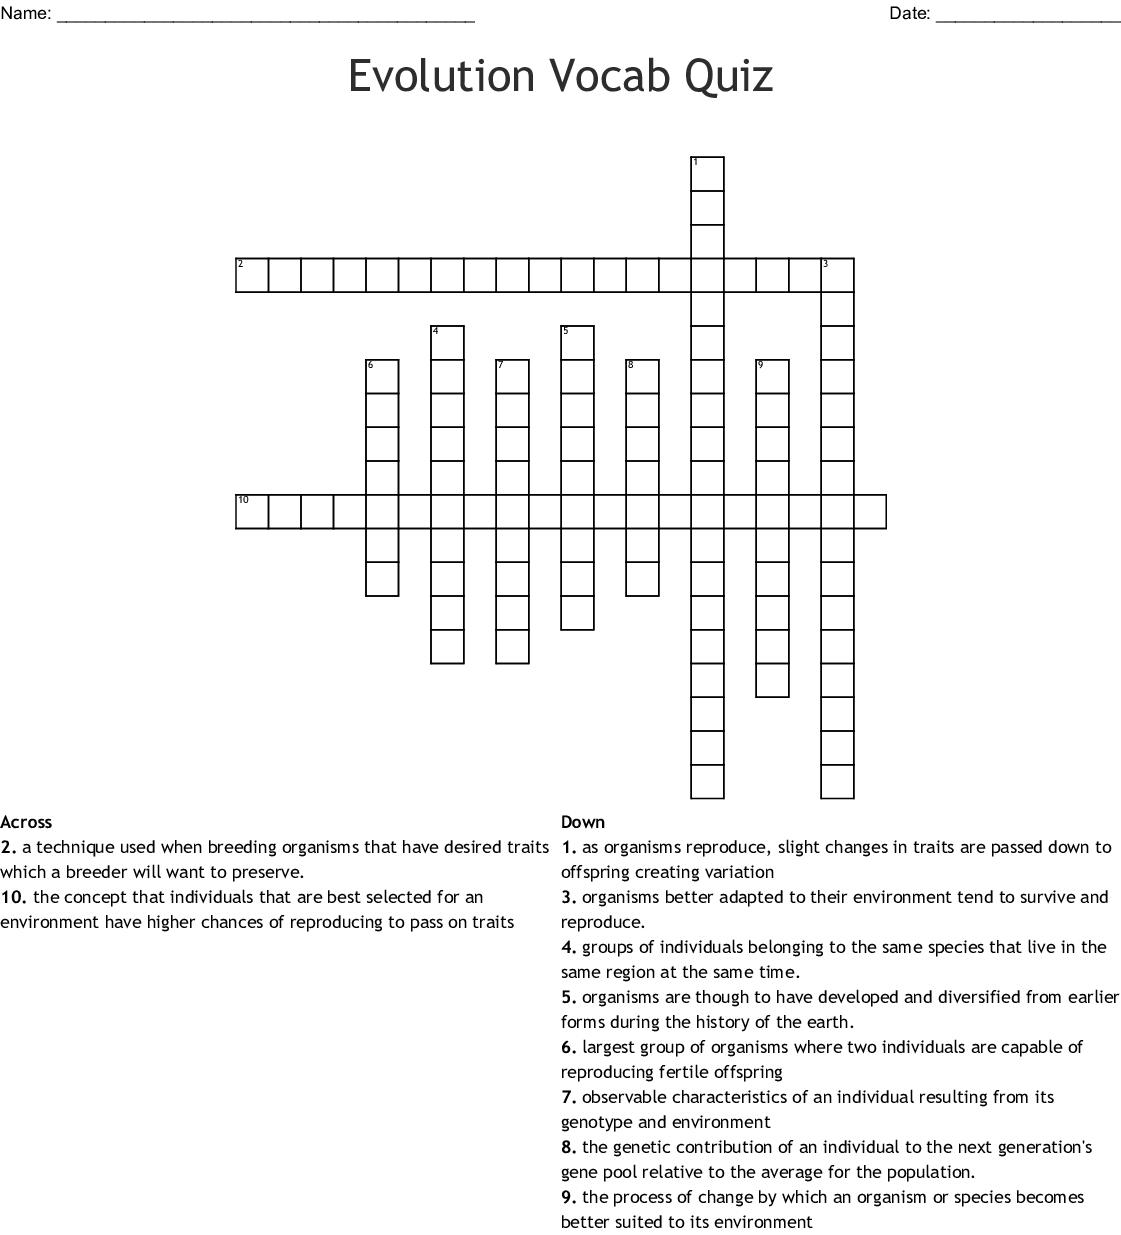 Evolution Vocab Quiz Crossword - Wordmint - Printable Vocabulary Quiz Crossword Puzzle